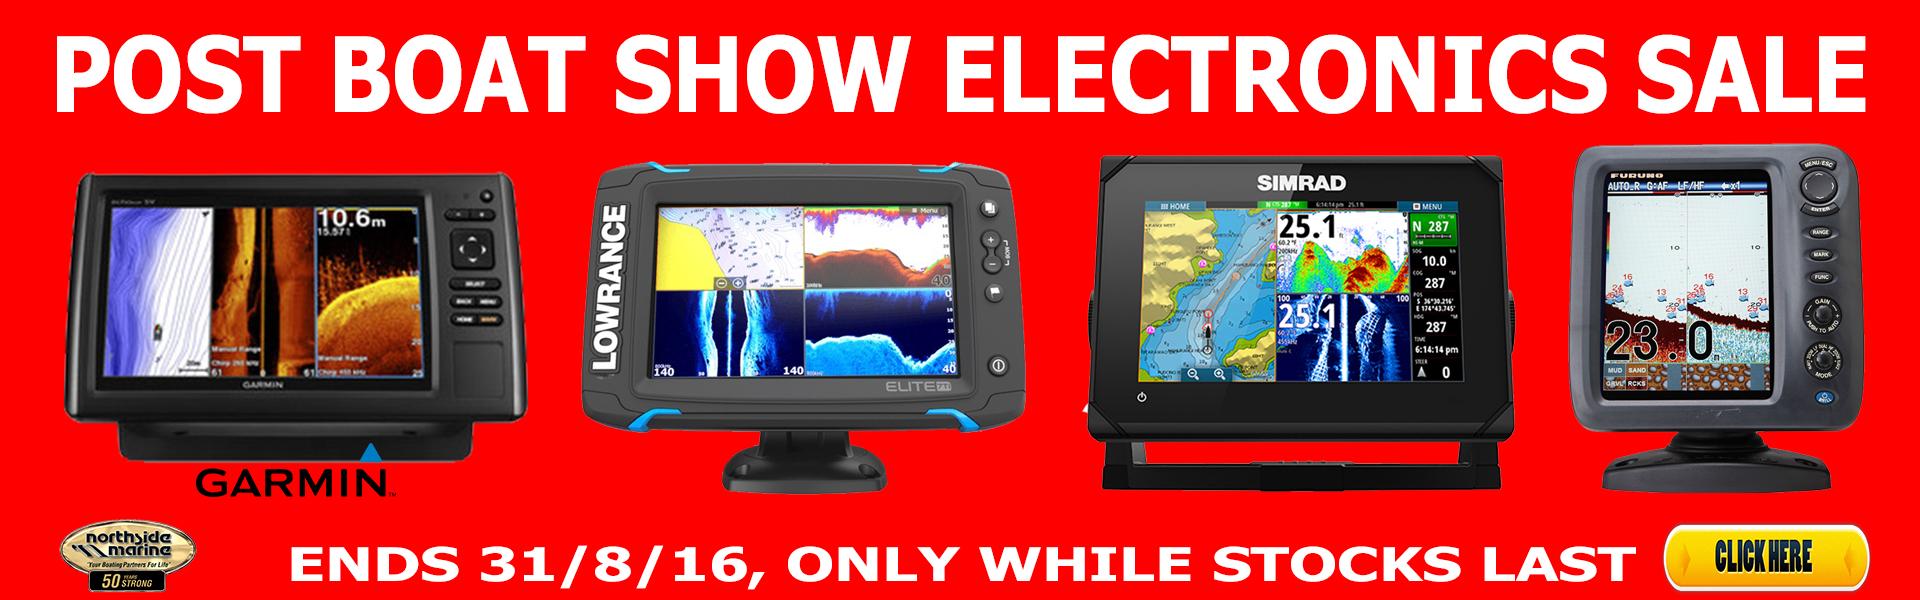 Post-Boat-Show-Electronics-Sale